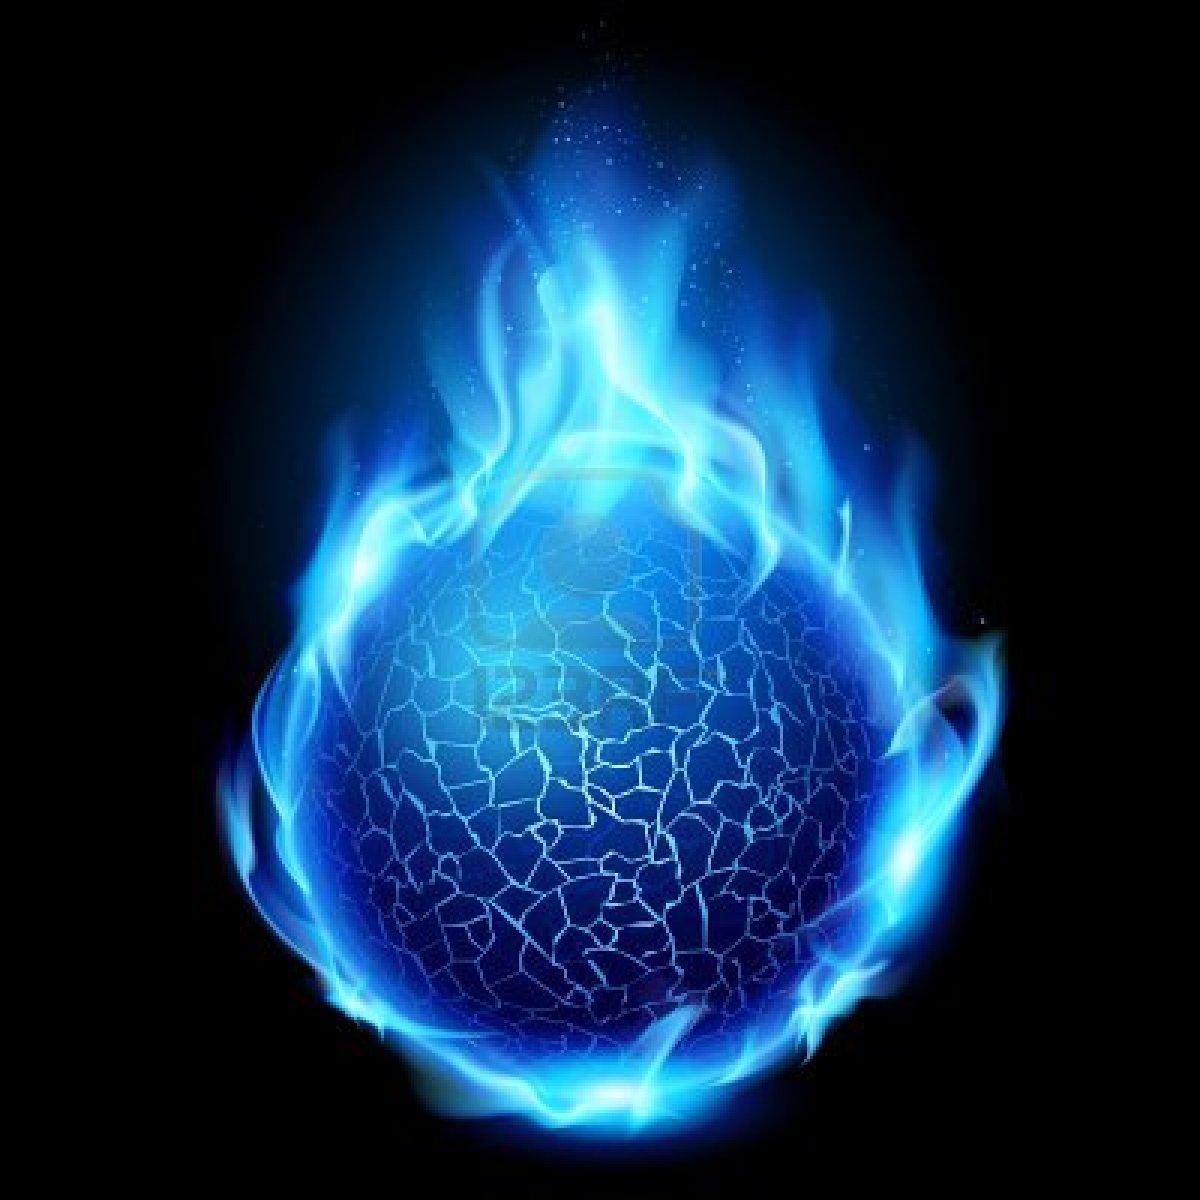 Image blue fire ball illustration on black